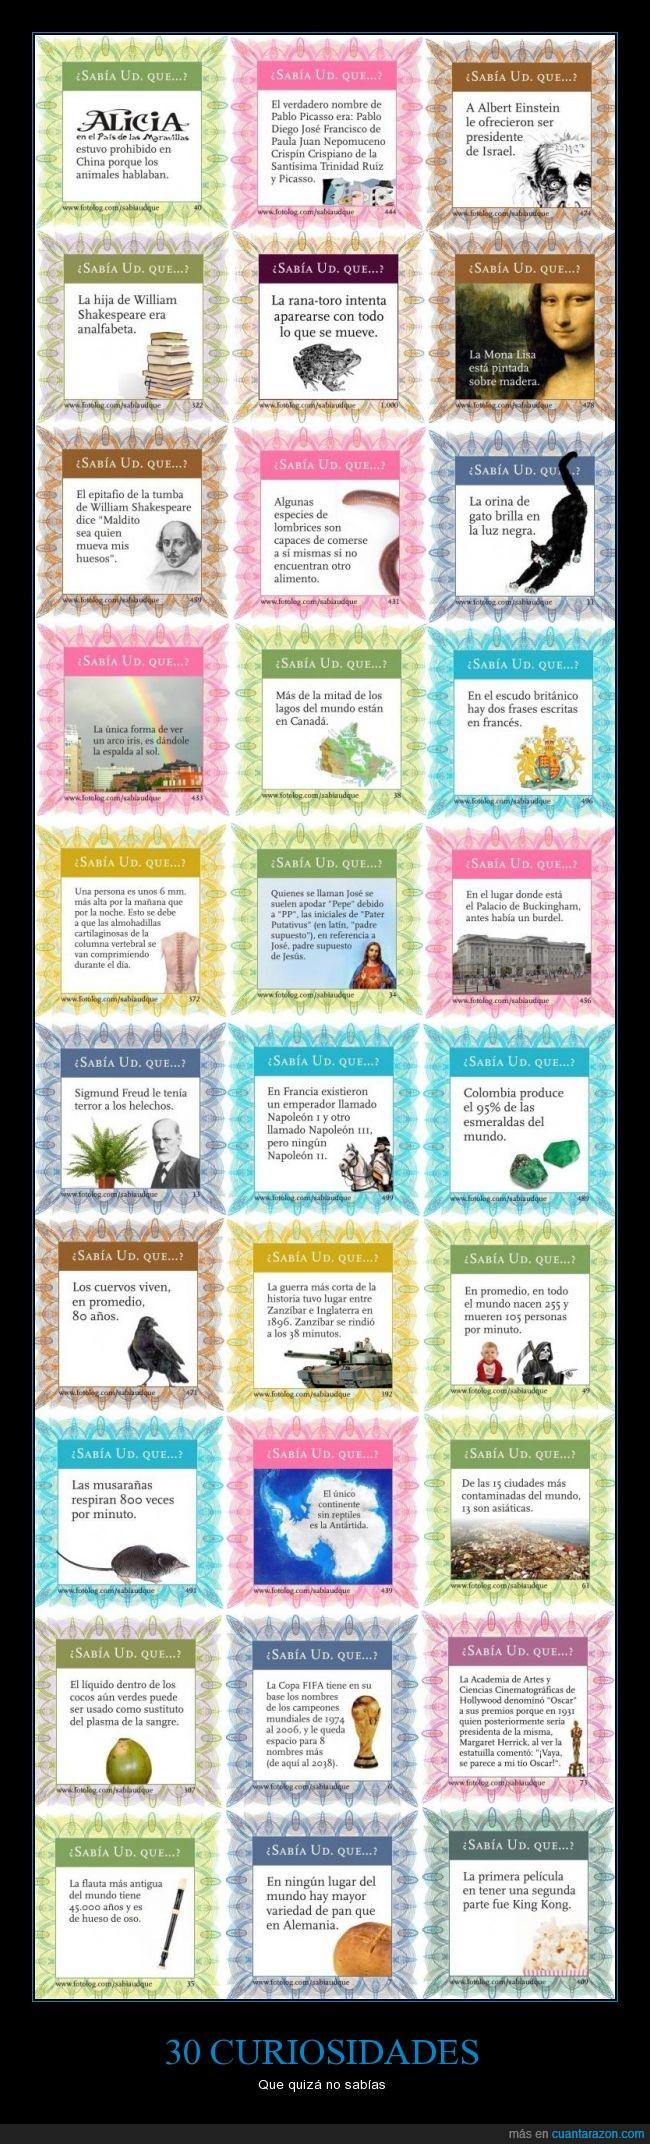 cuervo,curiosidad,curiosidades,datos,flauta,freud,interesante,miedo,pan,secuela,shakespeare